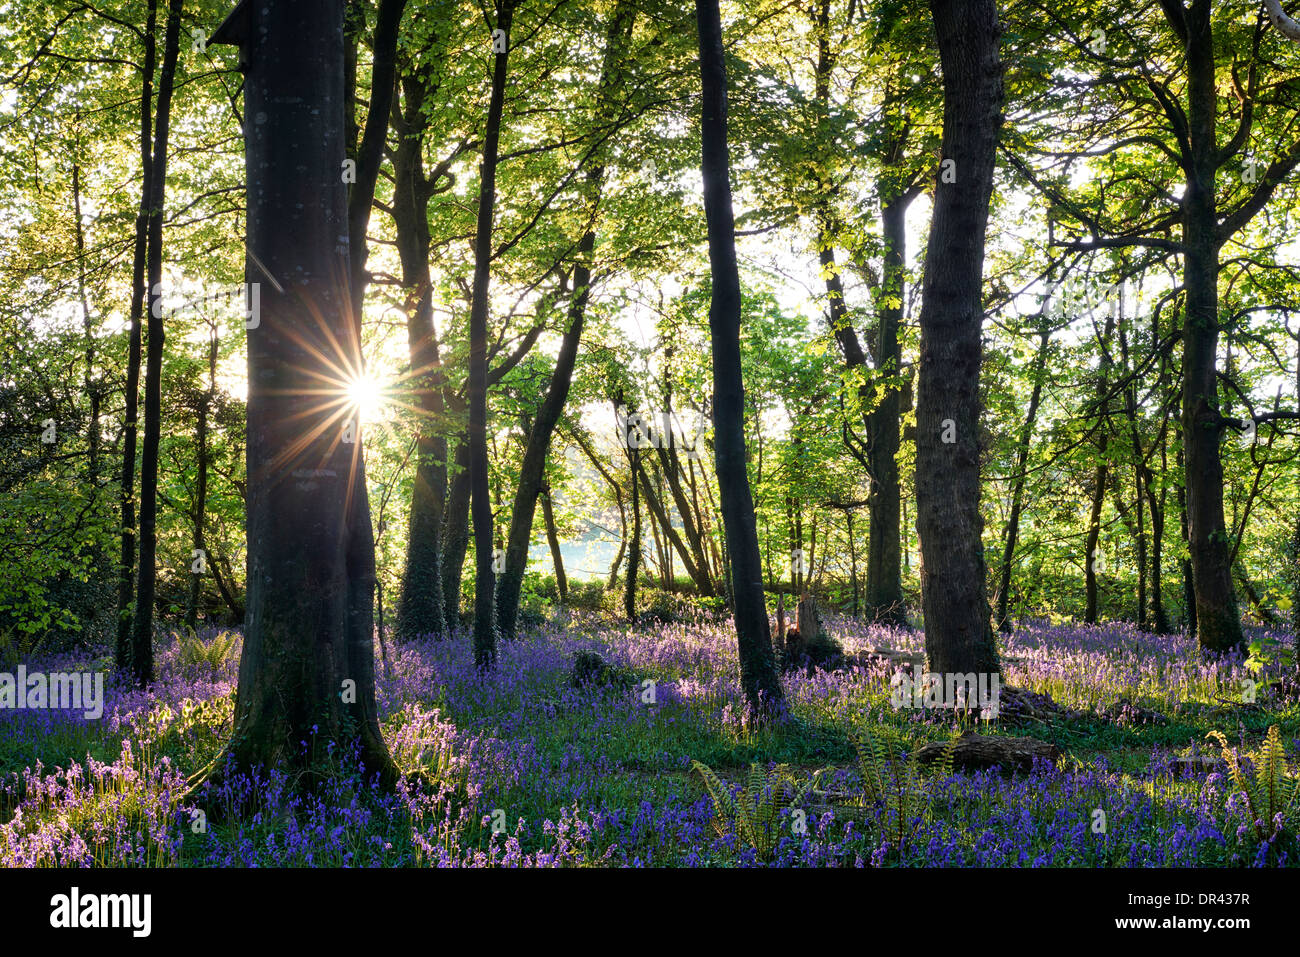 Sunlight bursting through the trees casting shadows over a carpet of bluebells Stock Photo